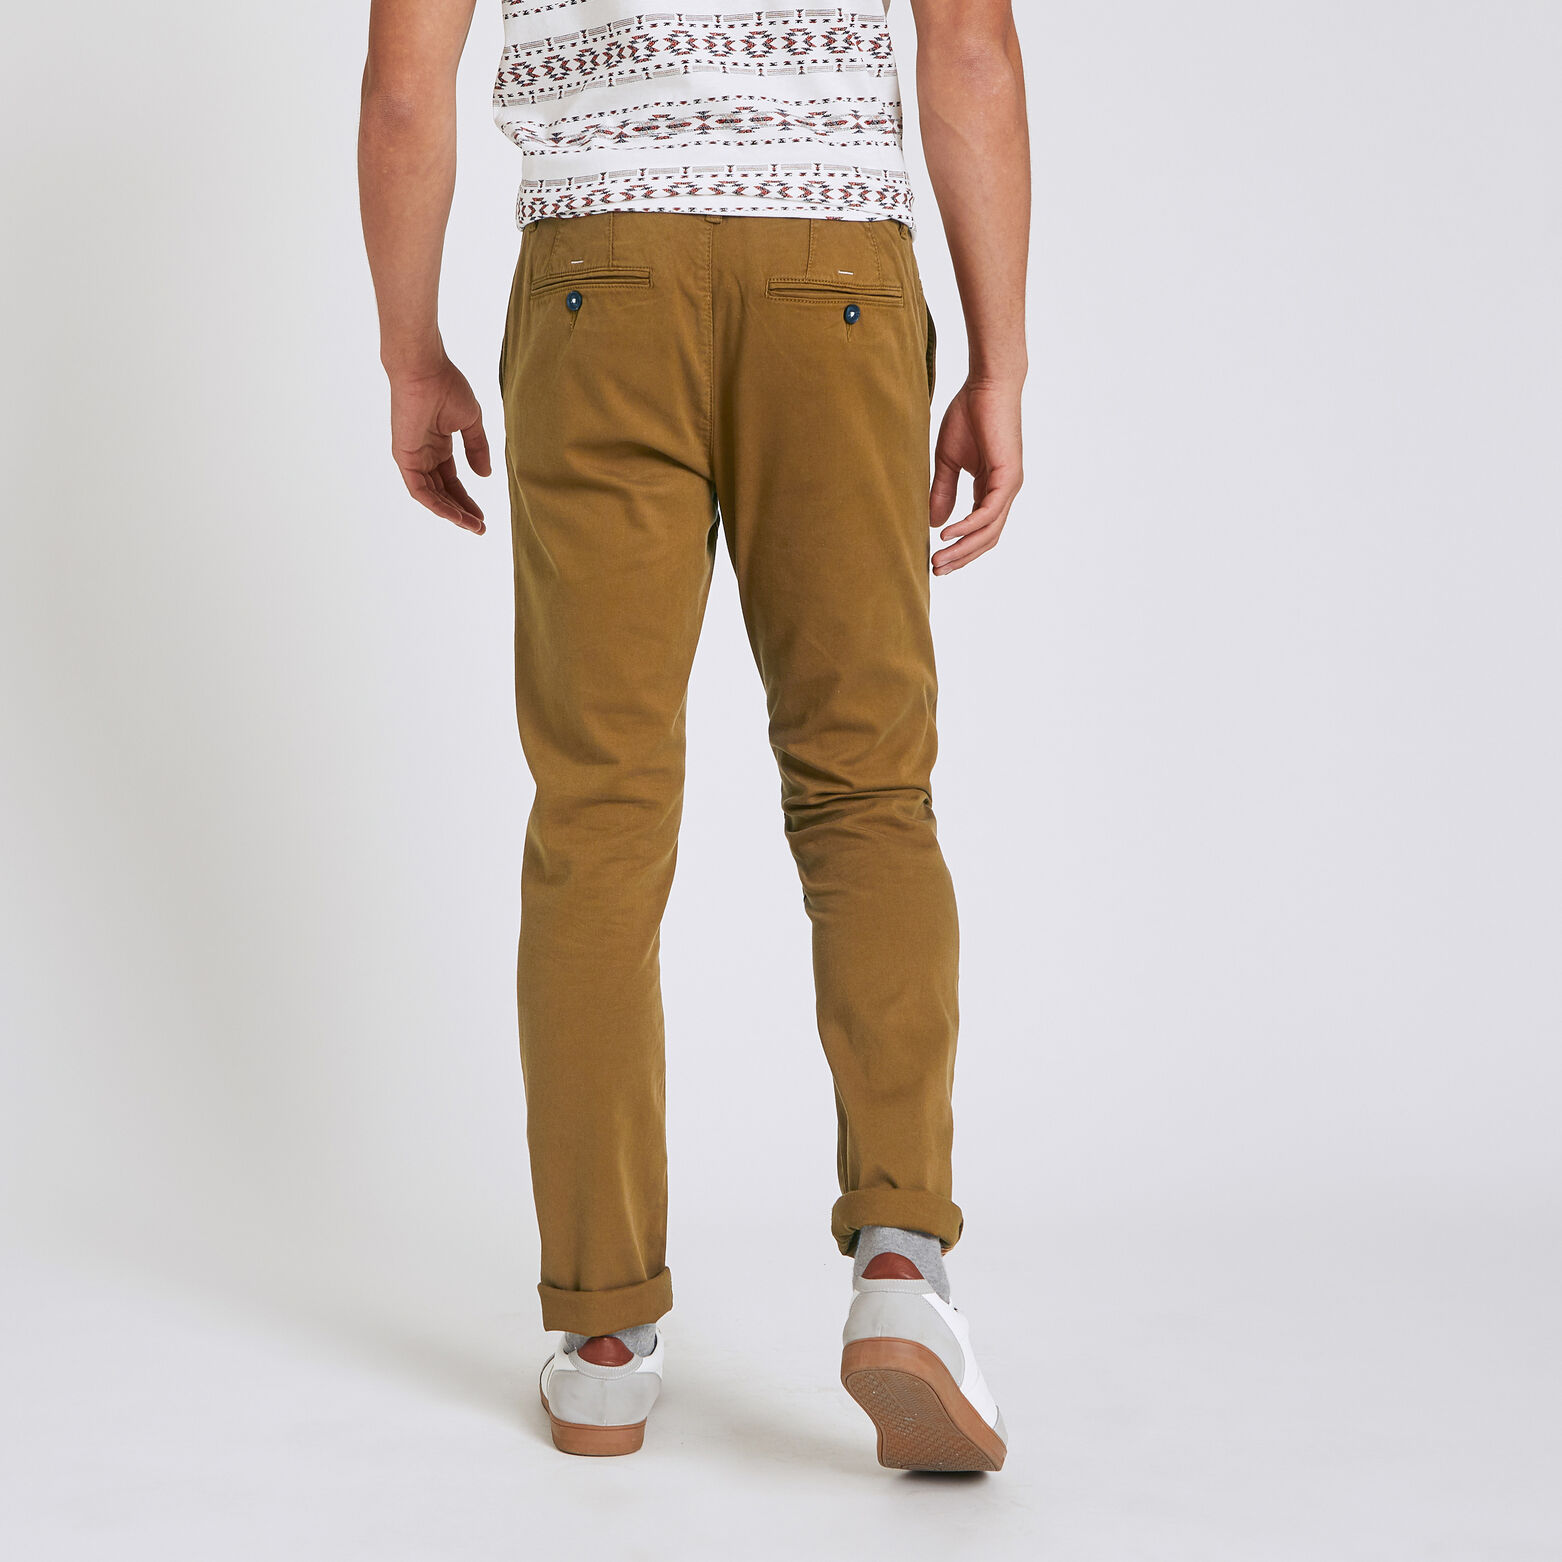 Pantalon chino droit canvas